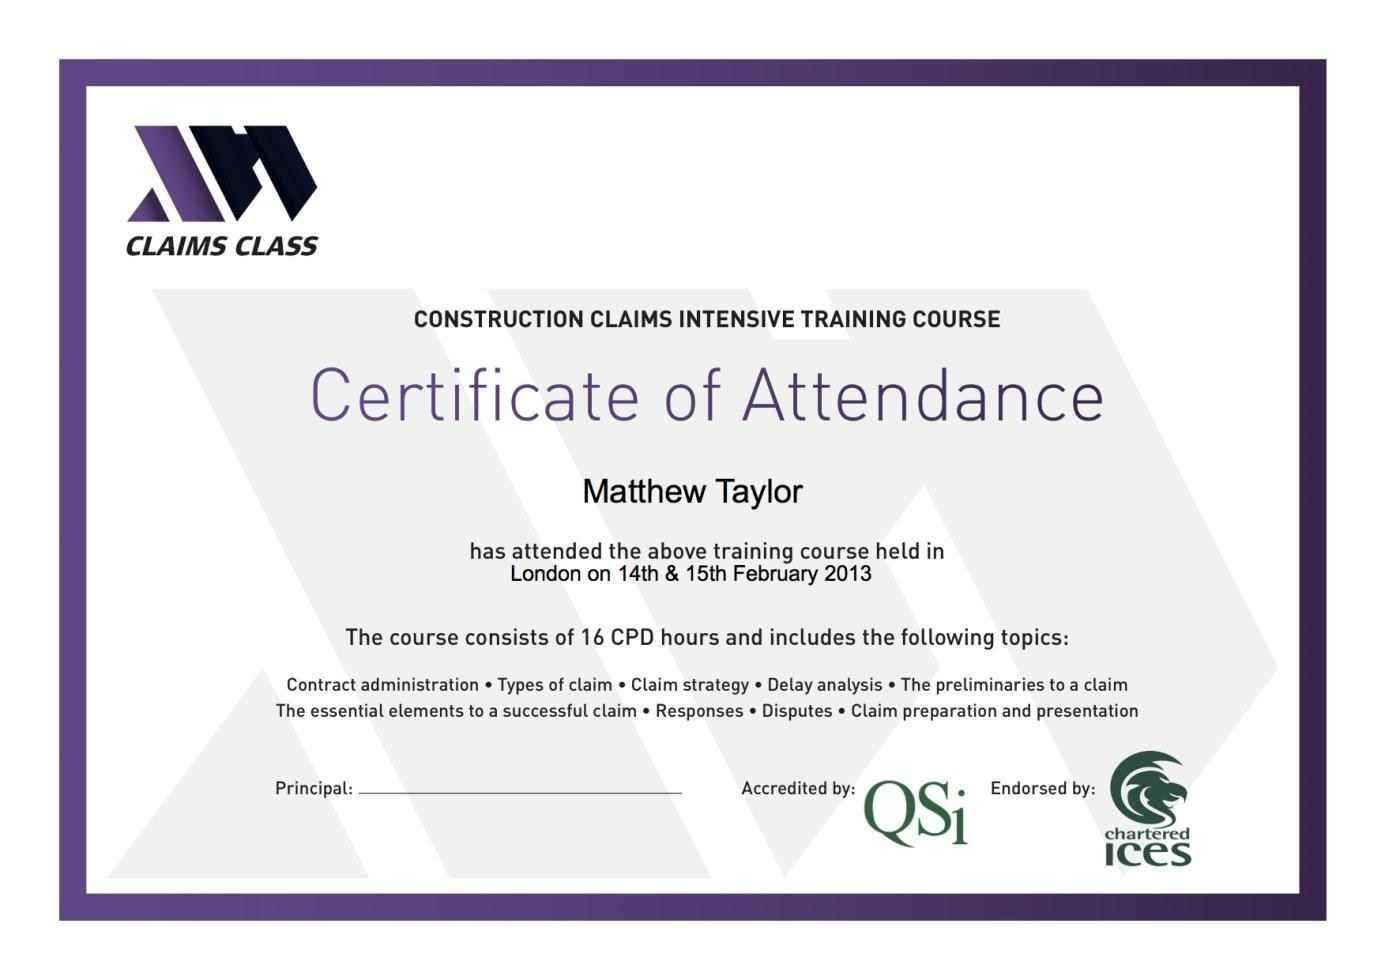 Certificates: Popular Attendance Certificate Template Word With Regard To Attendance Certificate Template Word